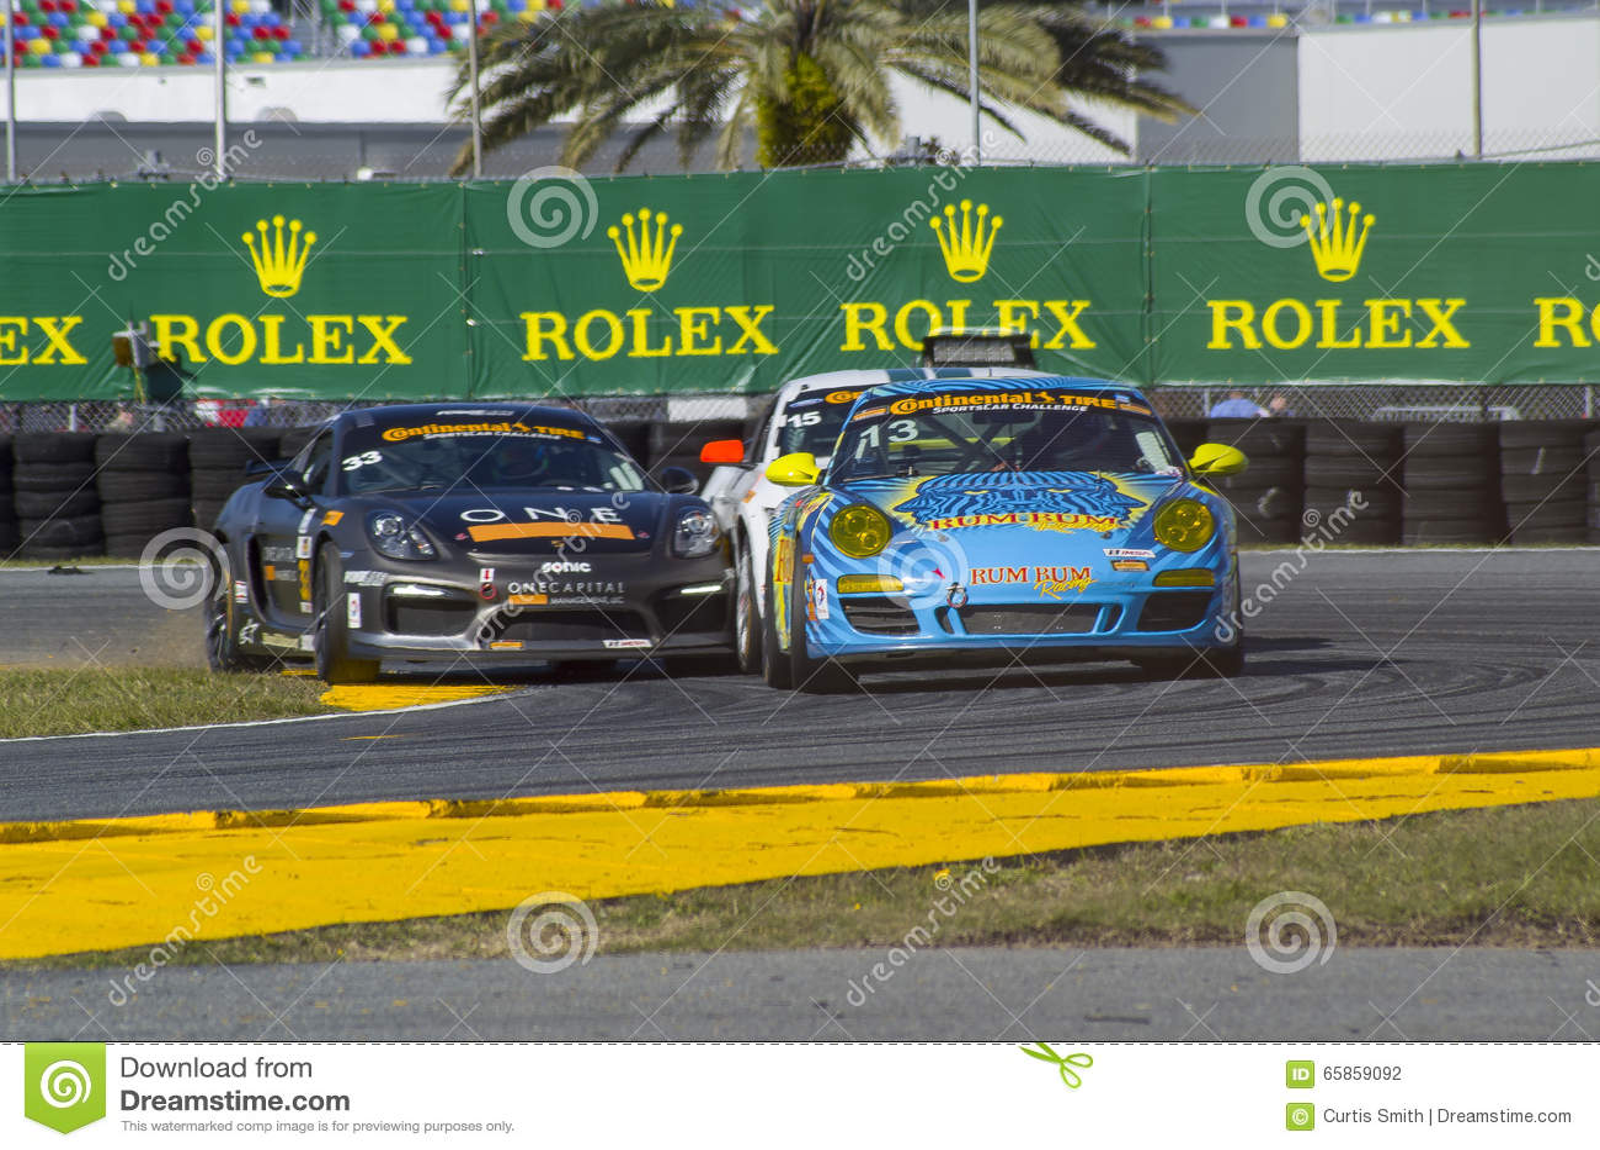 Race Action Collision Of Race Cars At Daytona Speedway Florida